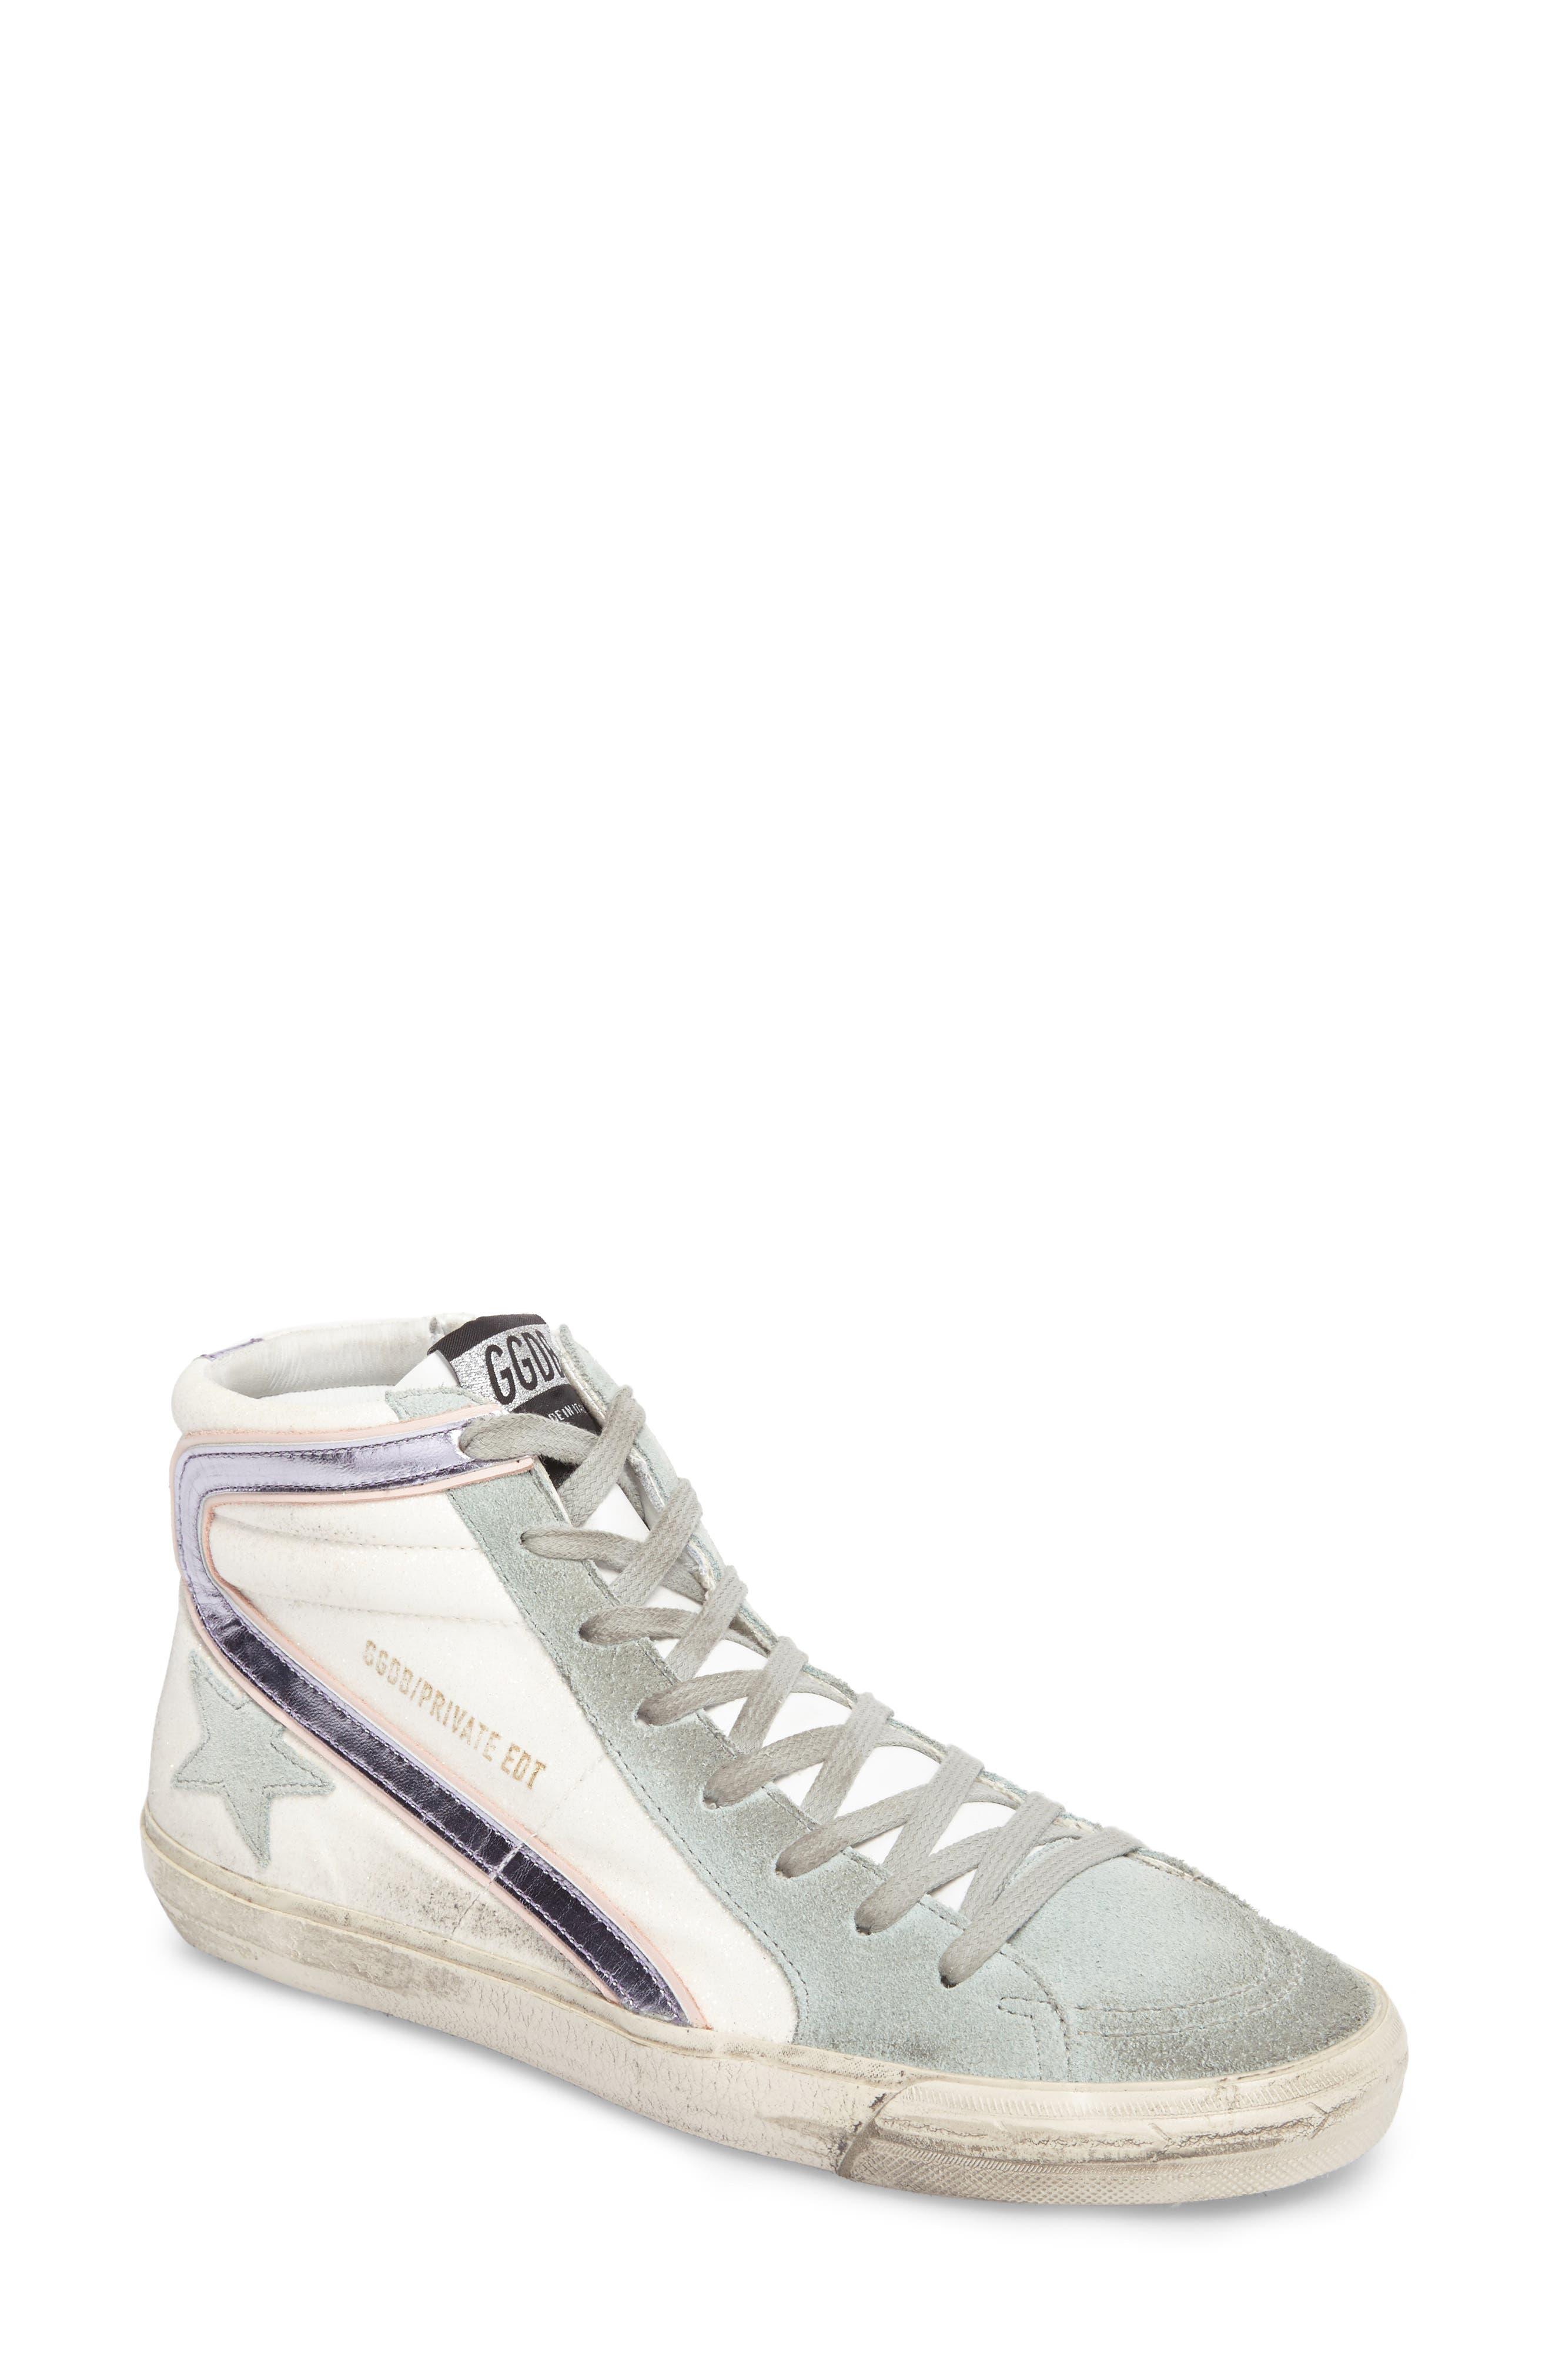 Slide High Top Sneaker,                             Main thumbnail 1, color,                             White/ Mint Green